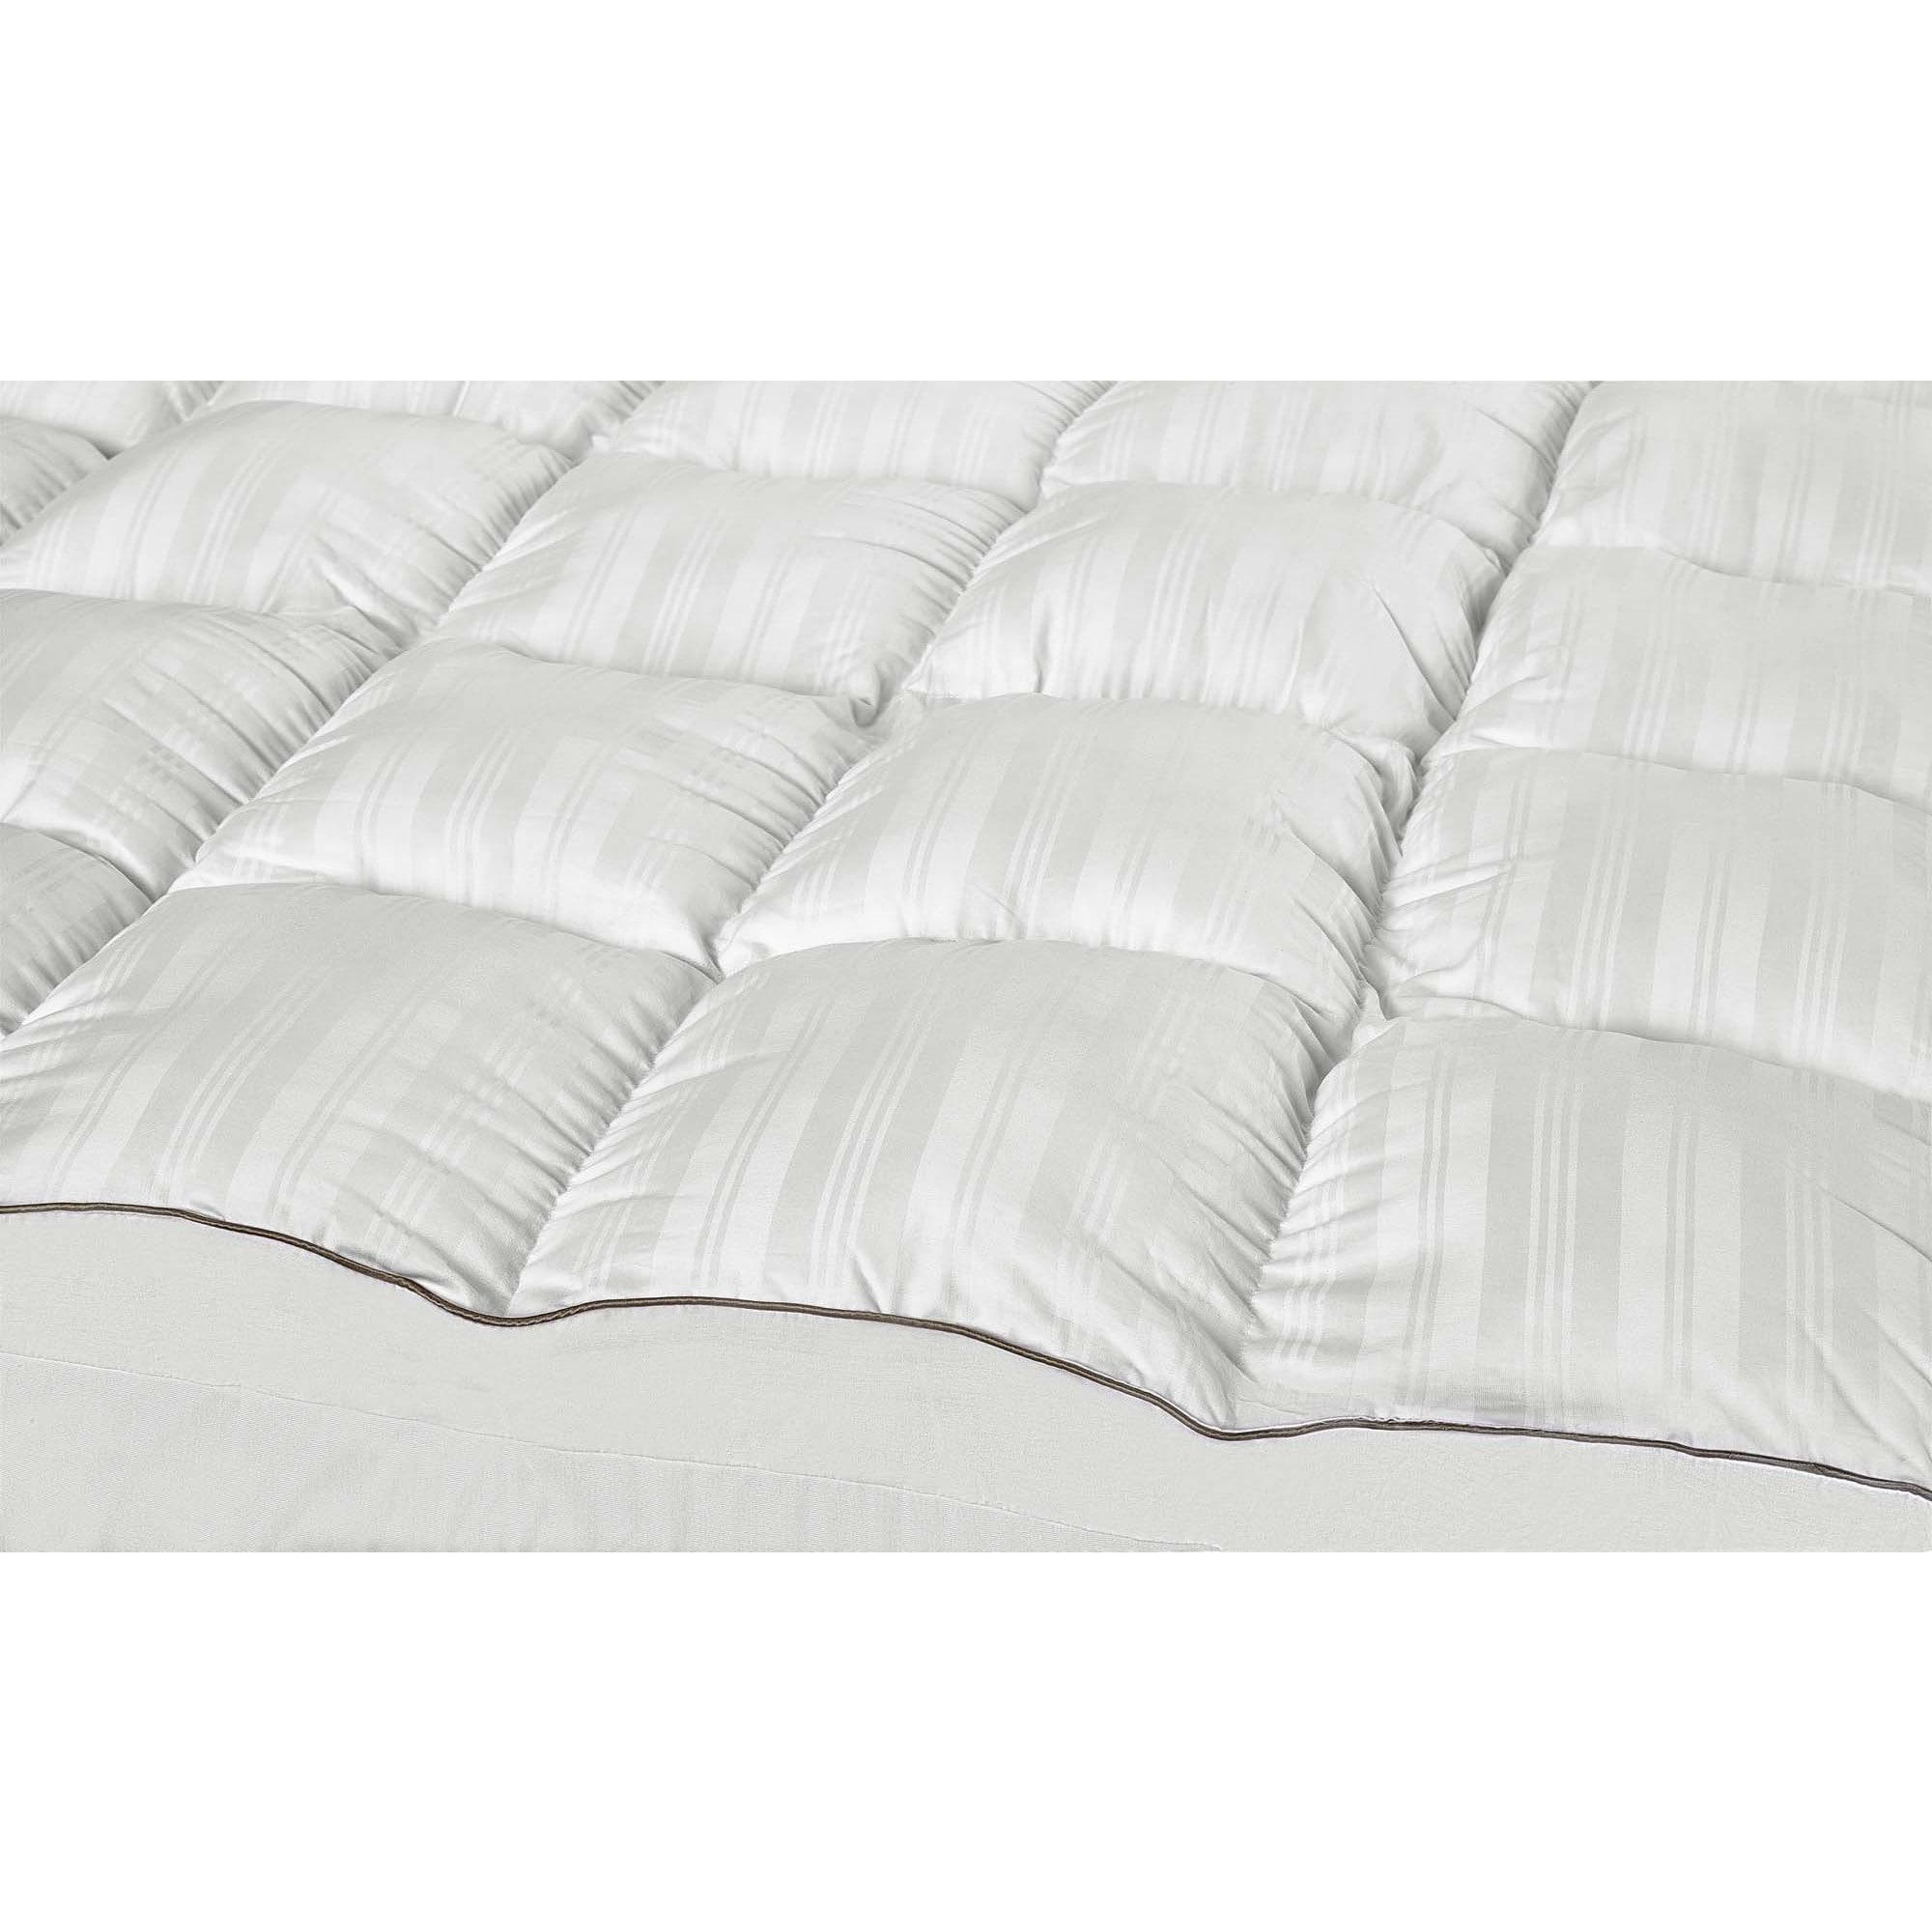 reviews pdx fiber foam restonic wayfair topper hybrid memory bath bed mattress